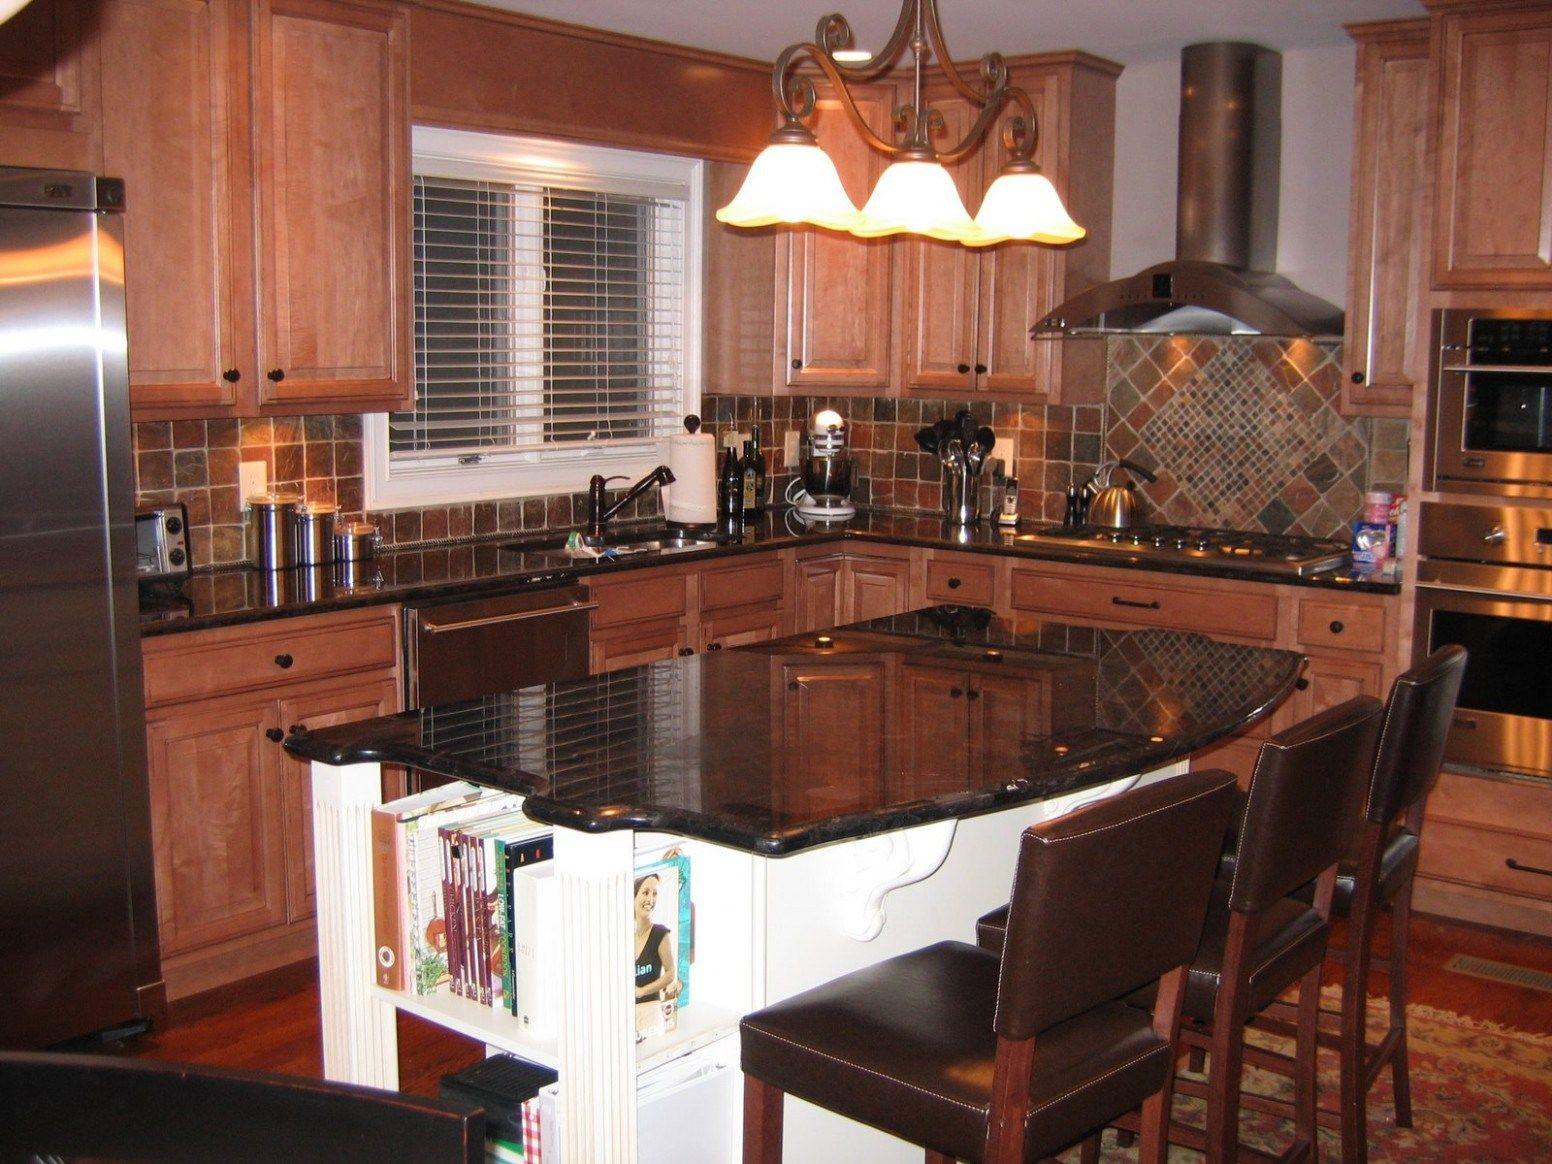 U-förmige küchendesigns pin by interior design on interior design  pinterest  kitchen